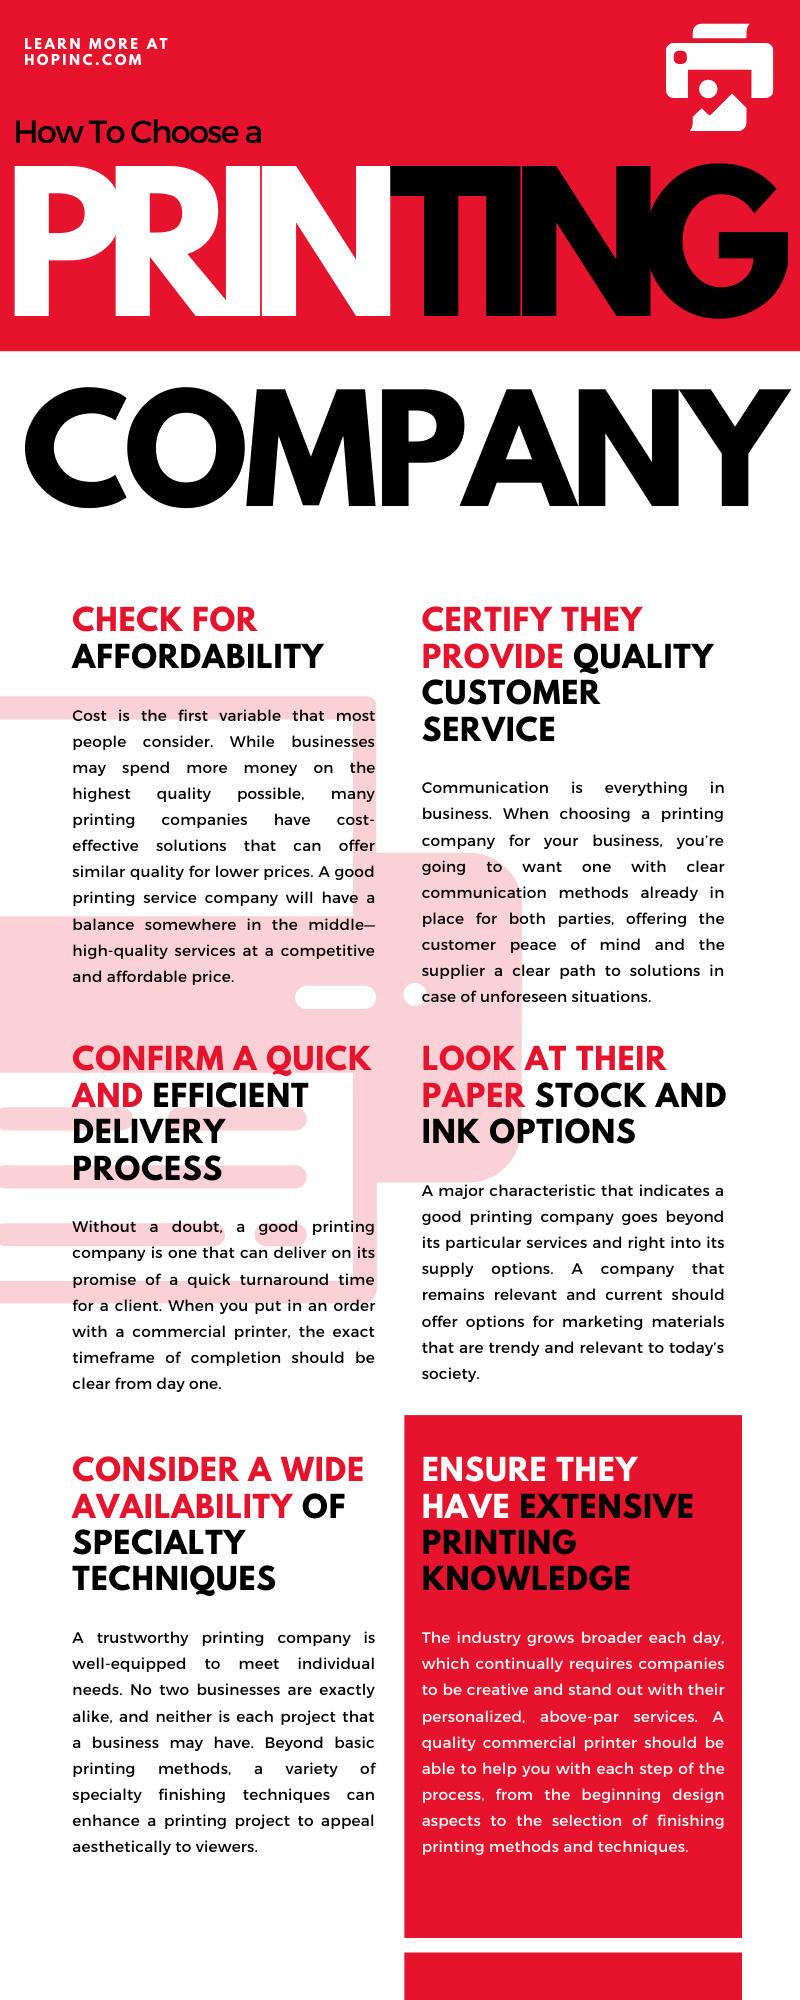 Choose a Printing Company